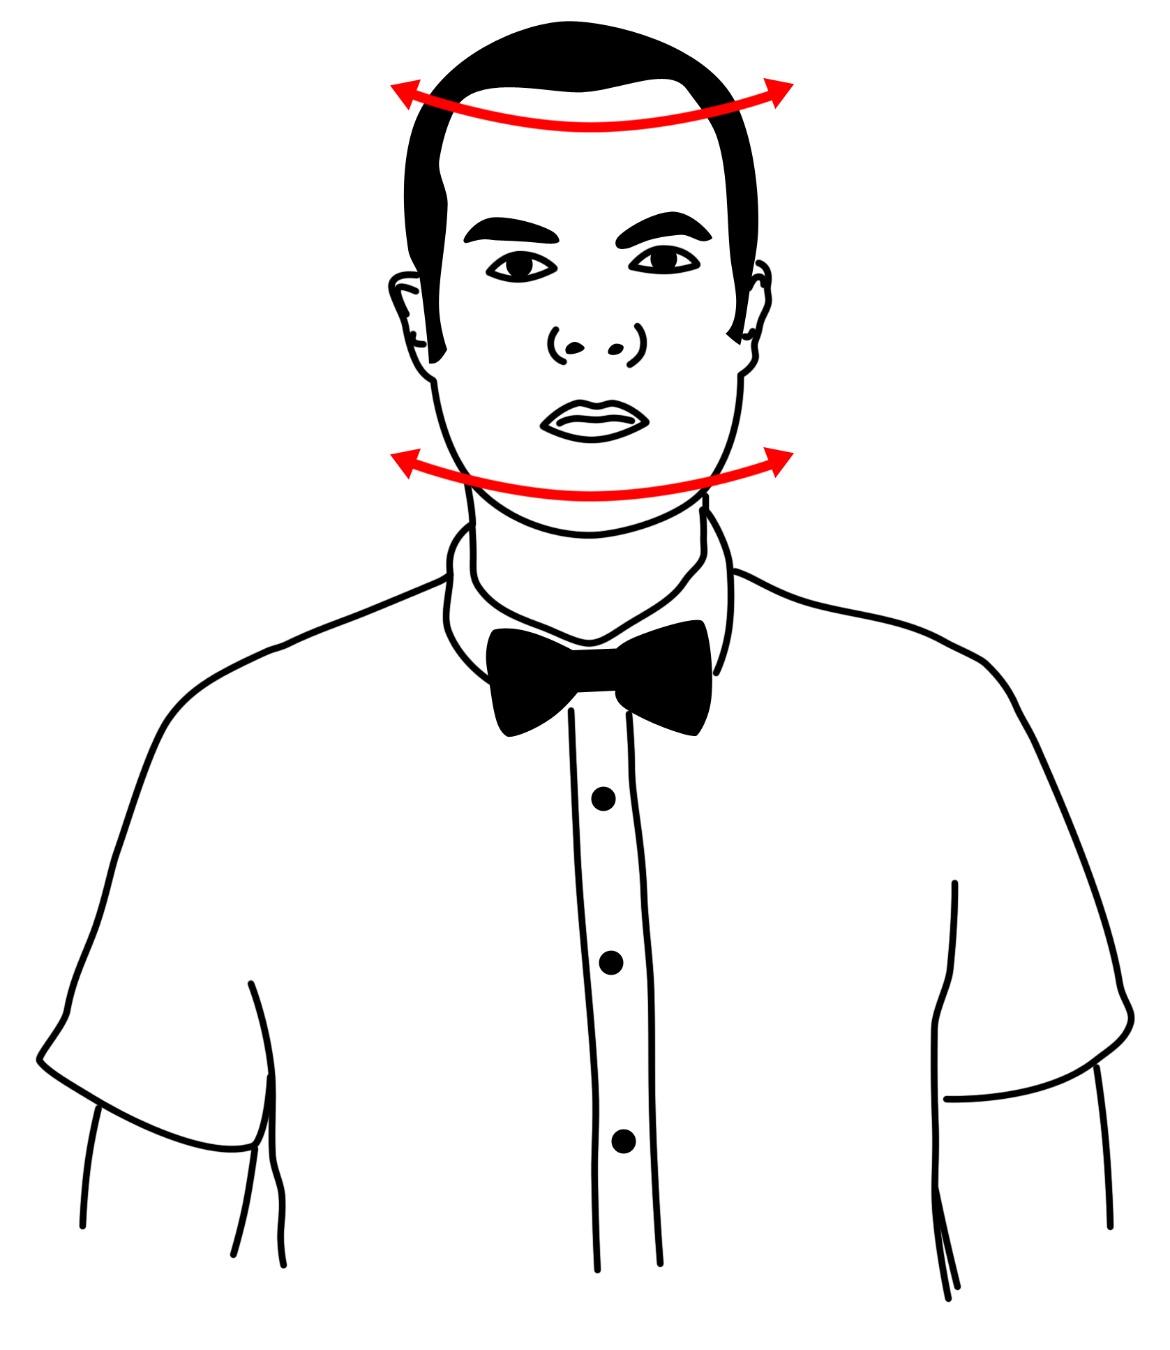 Schematic representation of head shaking